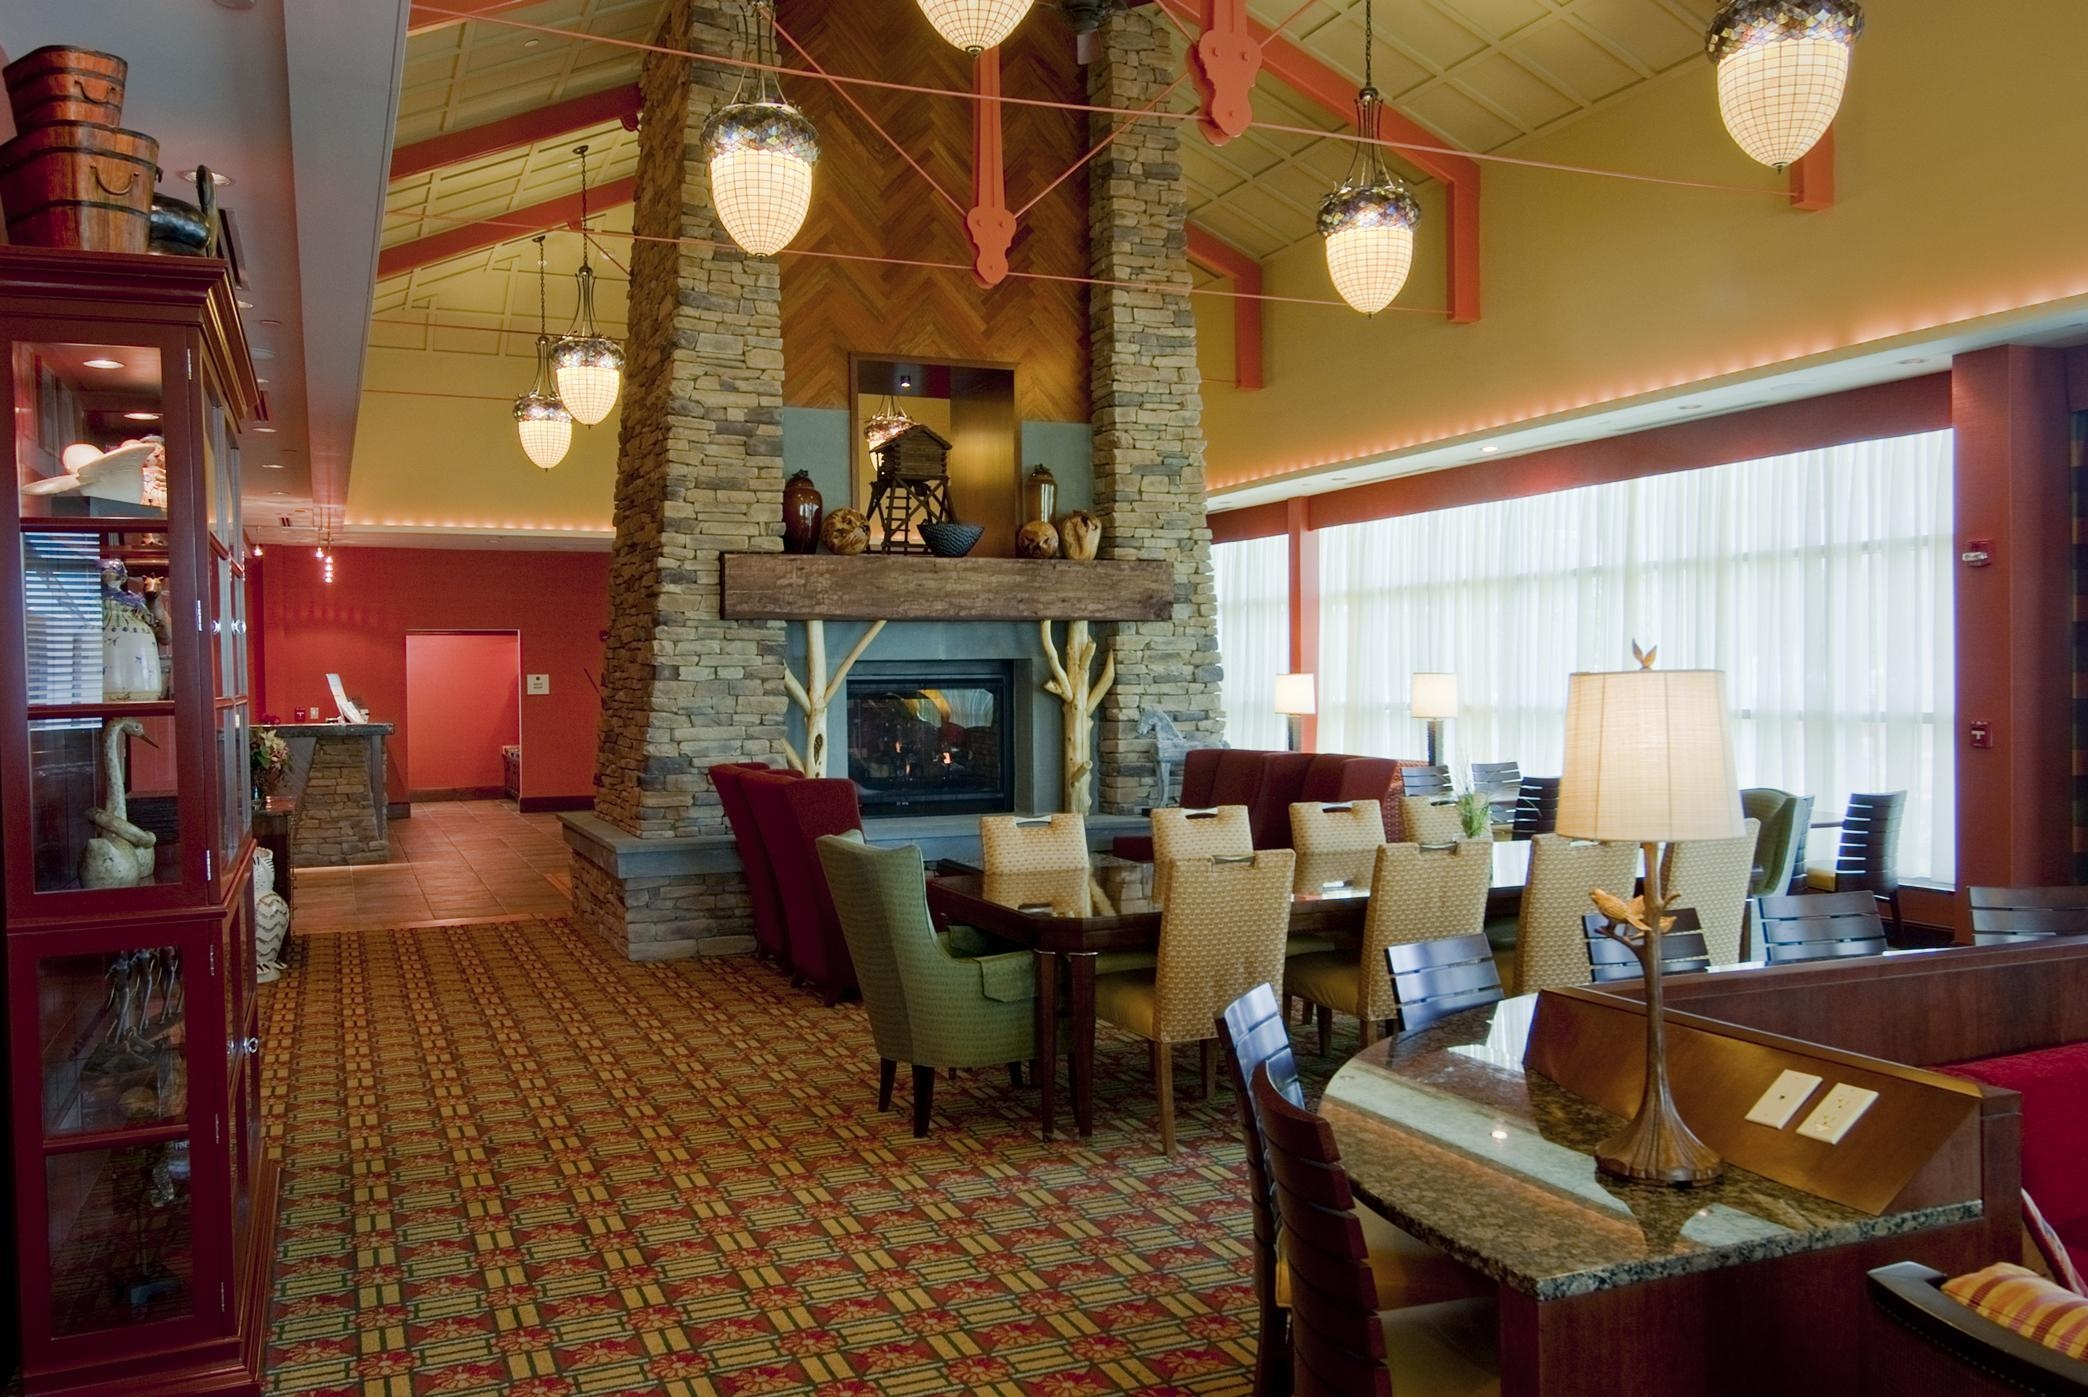 Homewood Suites Lodge